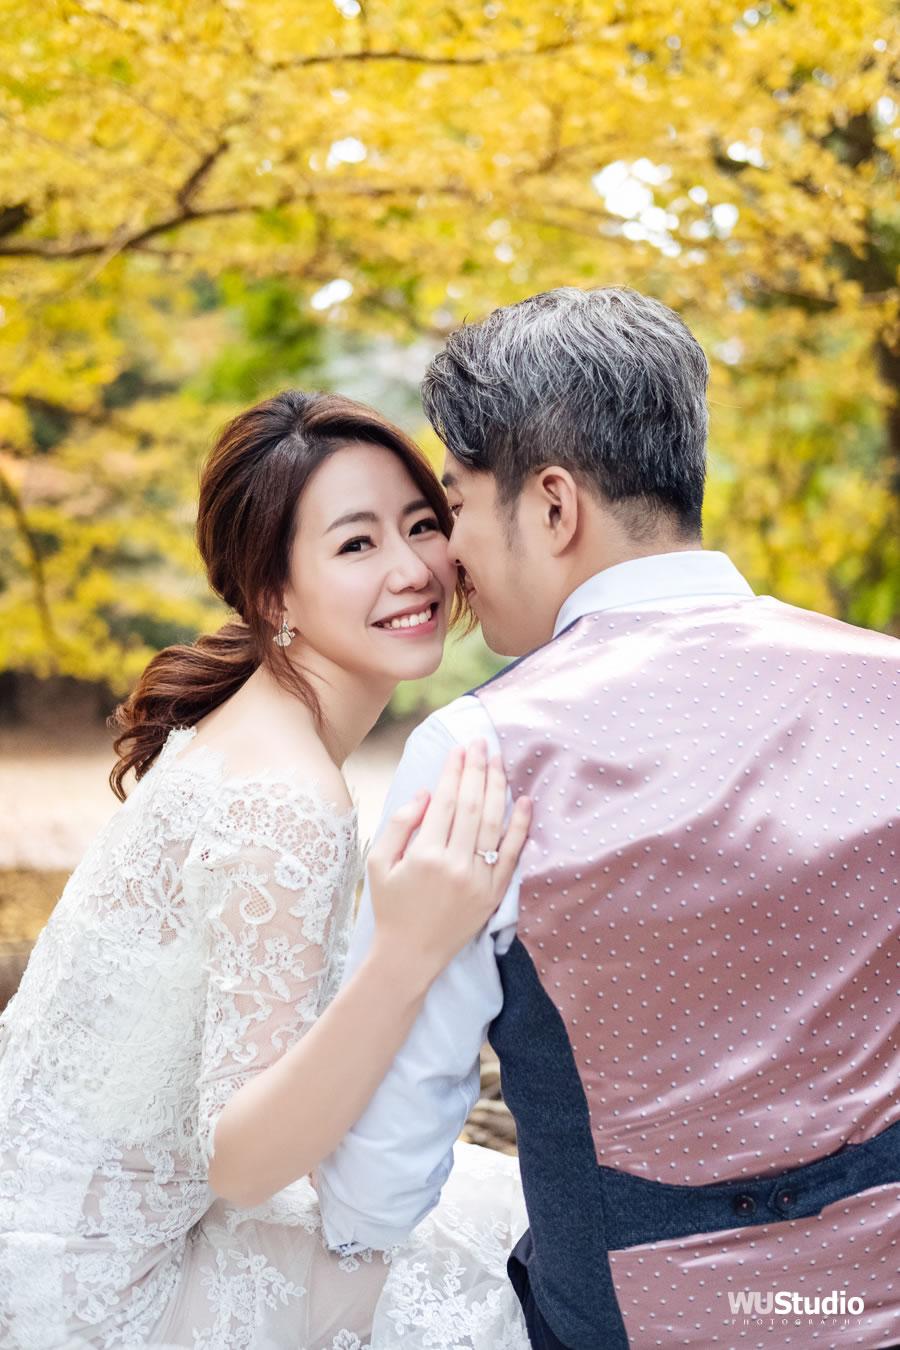 日本 京都 奈良 楓葉 婚紗攝影 | Wayne & Andrea